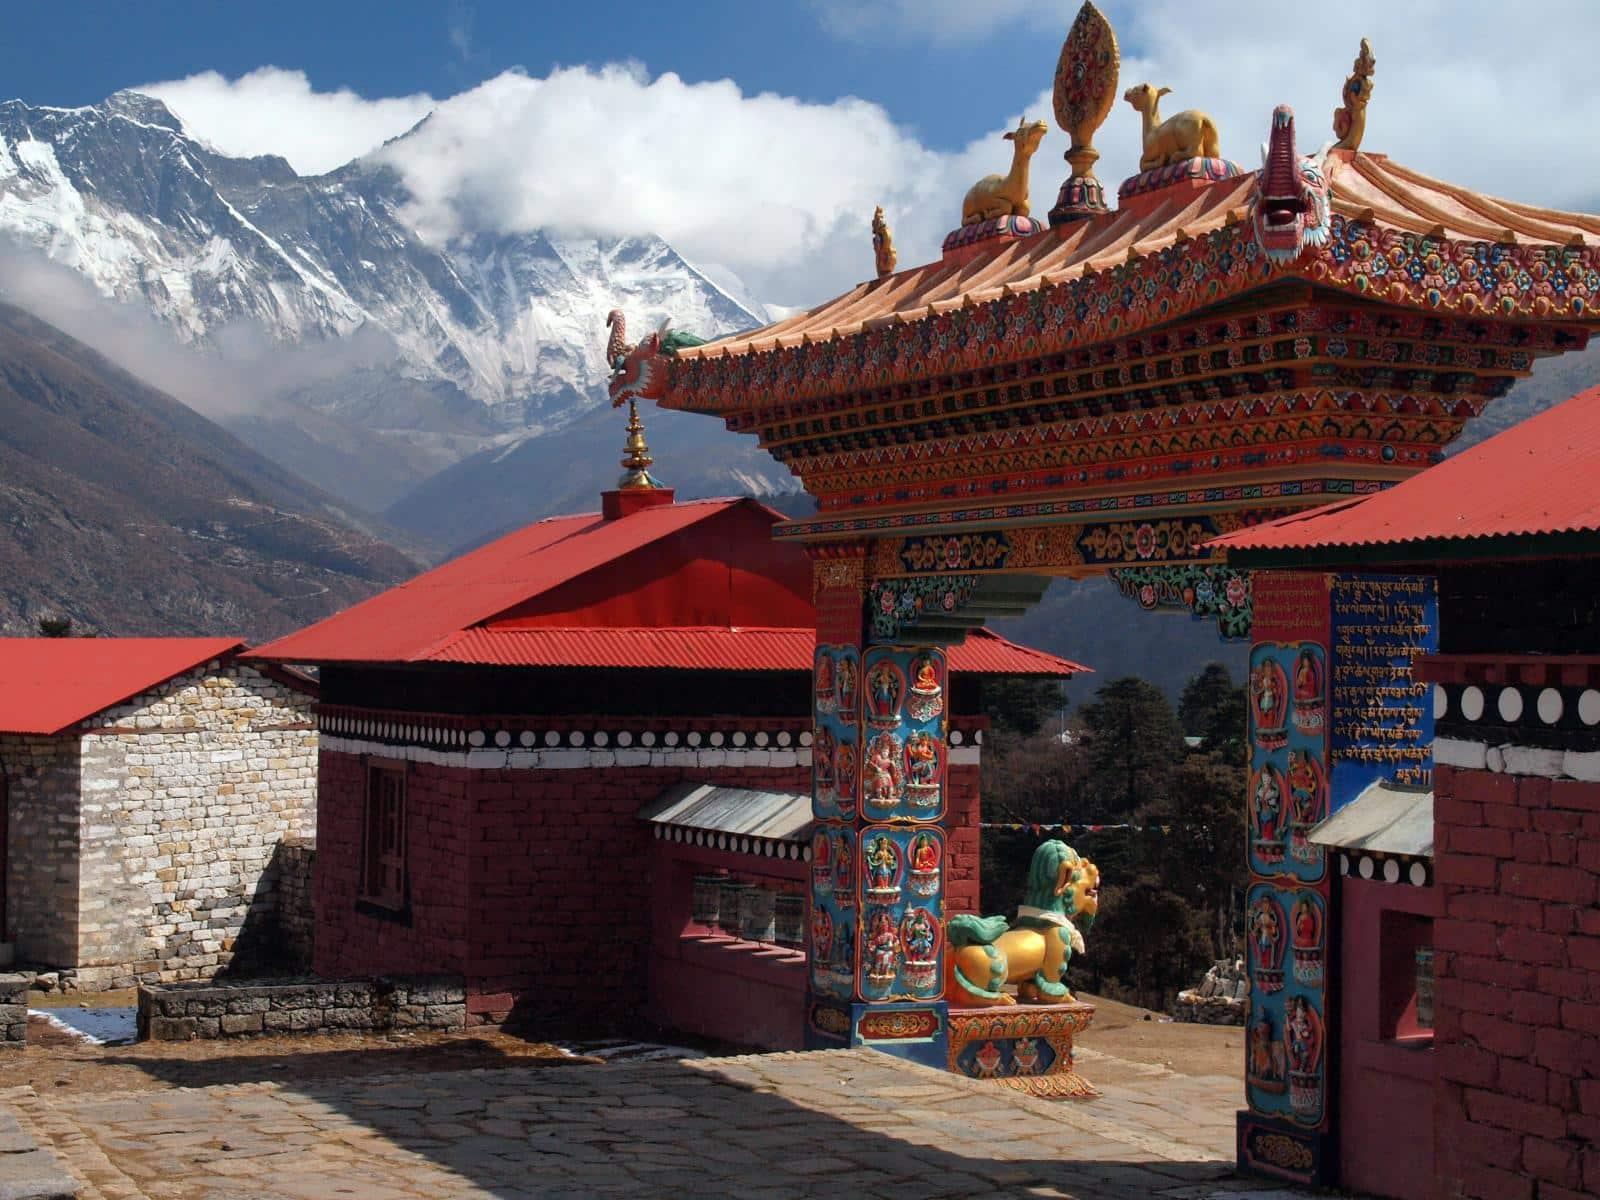 Tengboche Mani Rimdu Festival, 14 Day Guided Trek